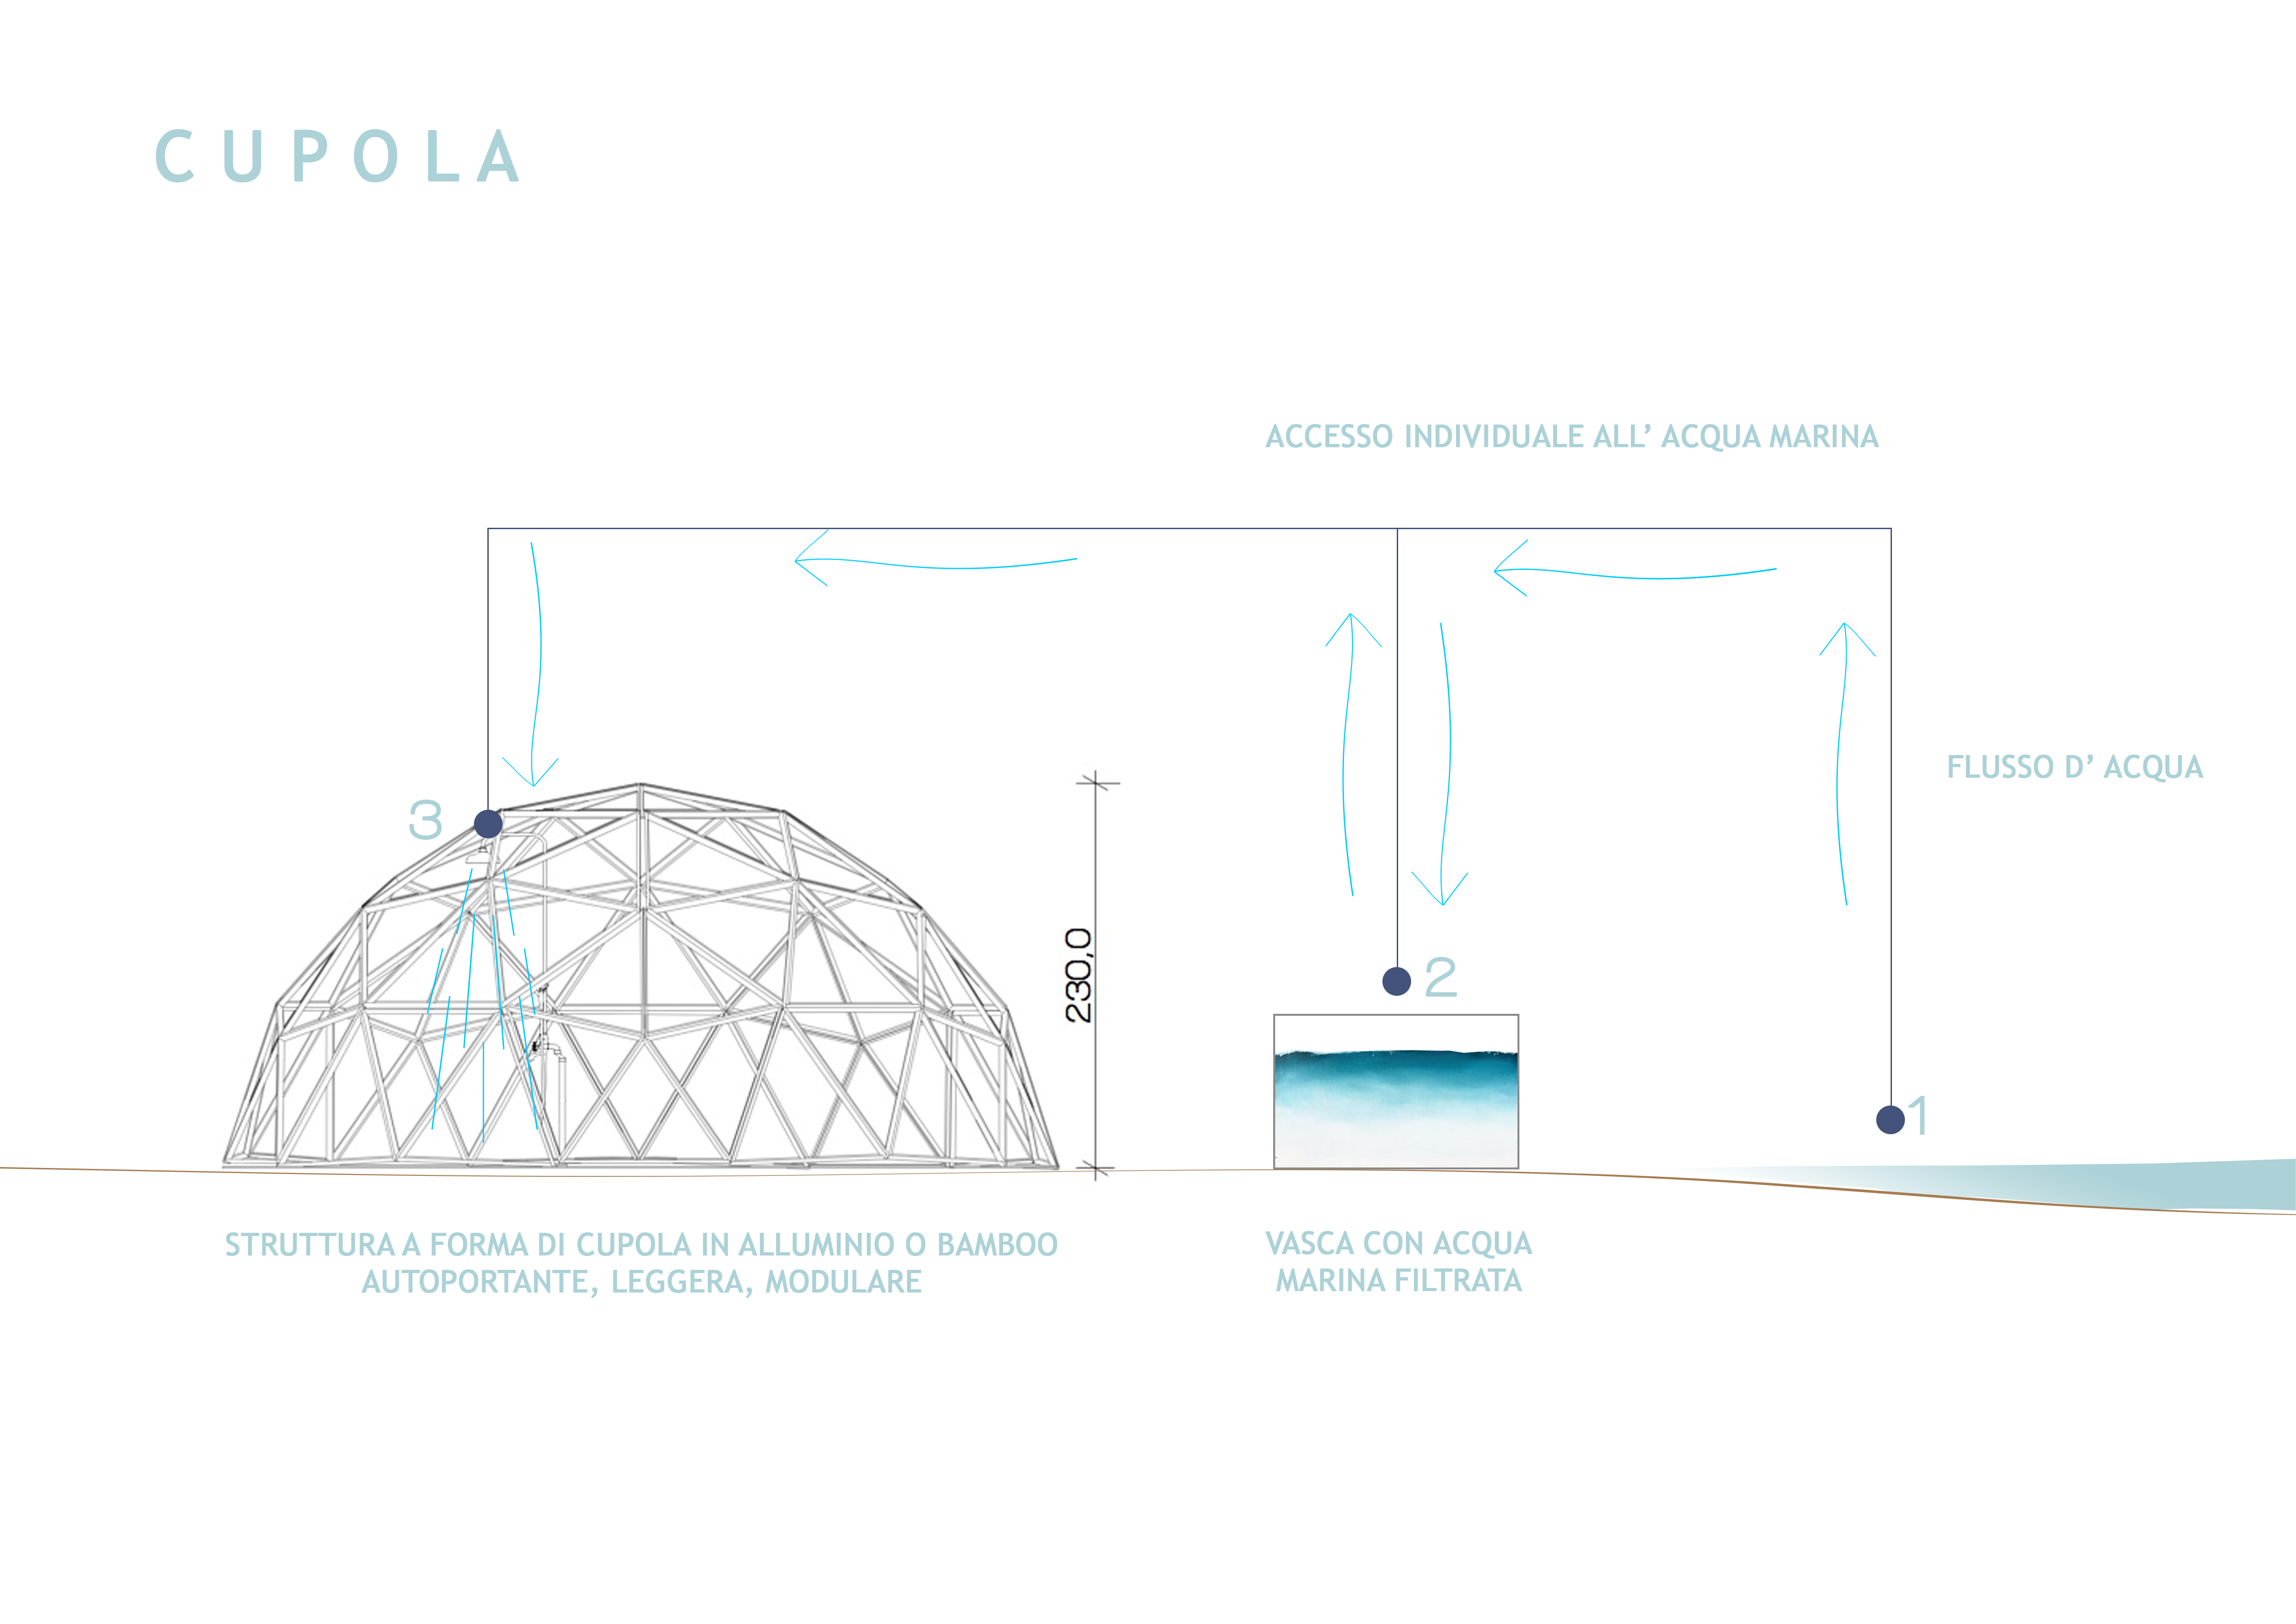 Una struttura semplice / OBICUA Architettura